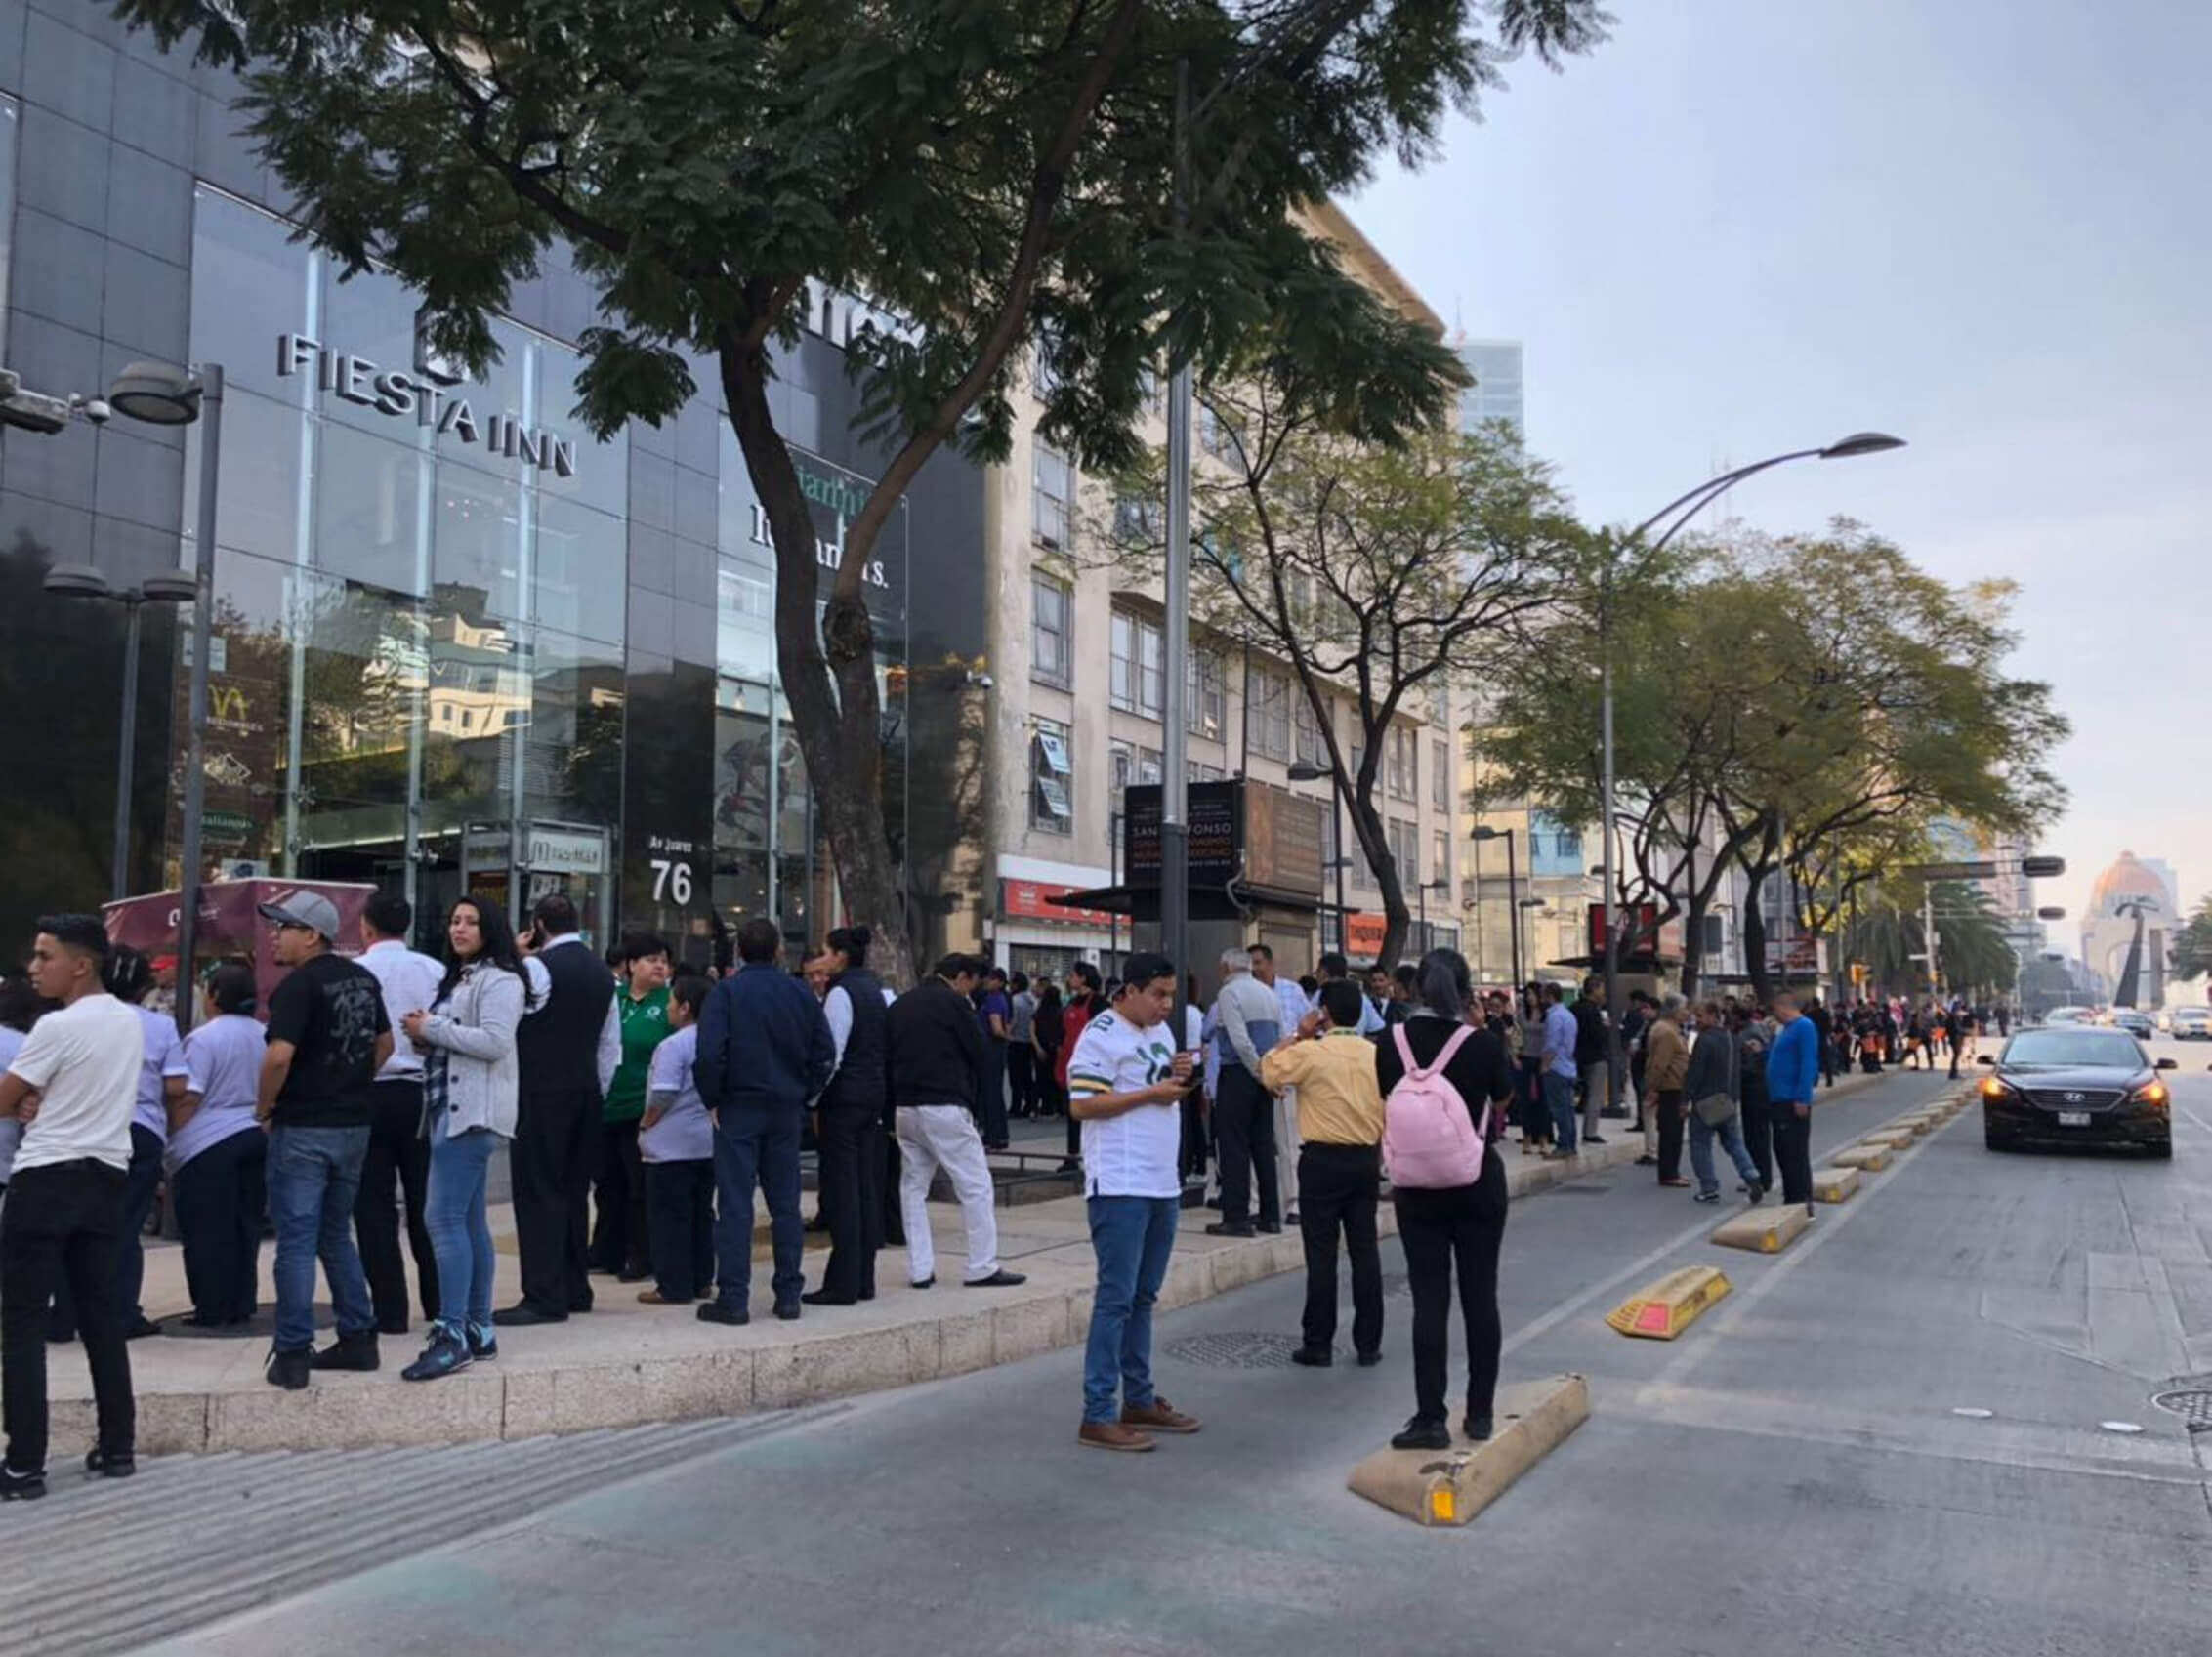 Sismo de 5.0 se registra al este de Acapulco, México